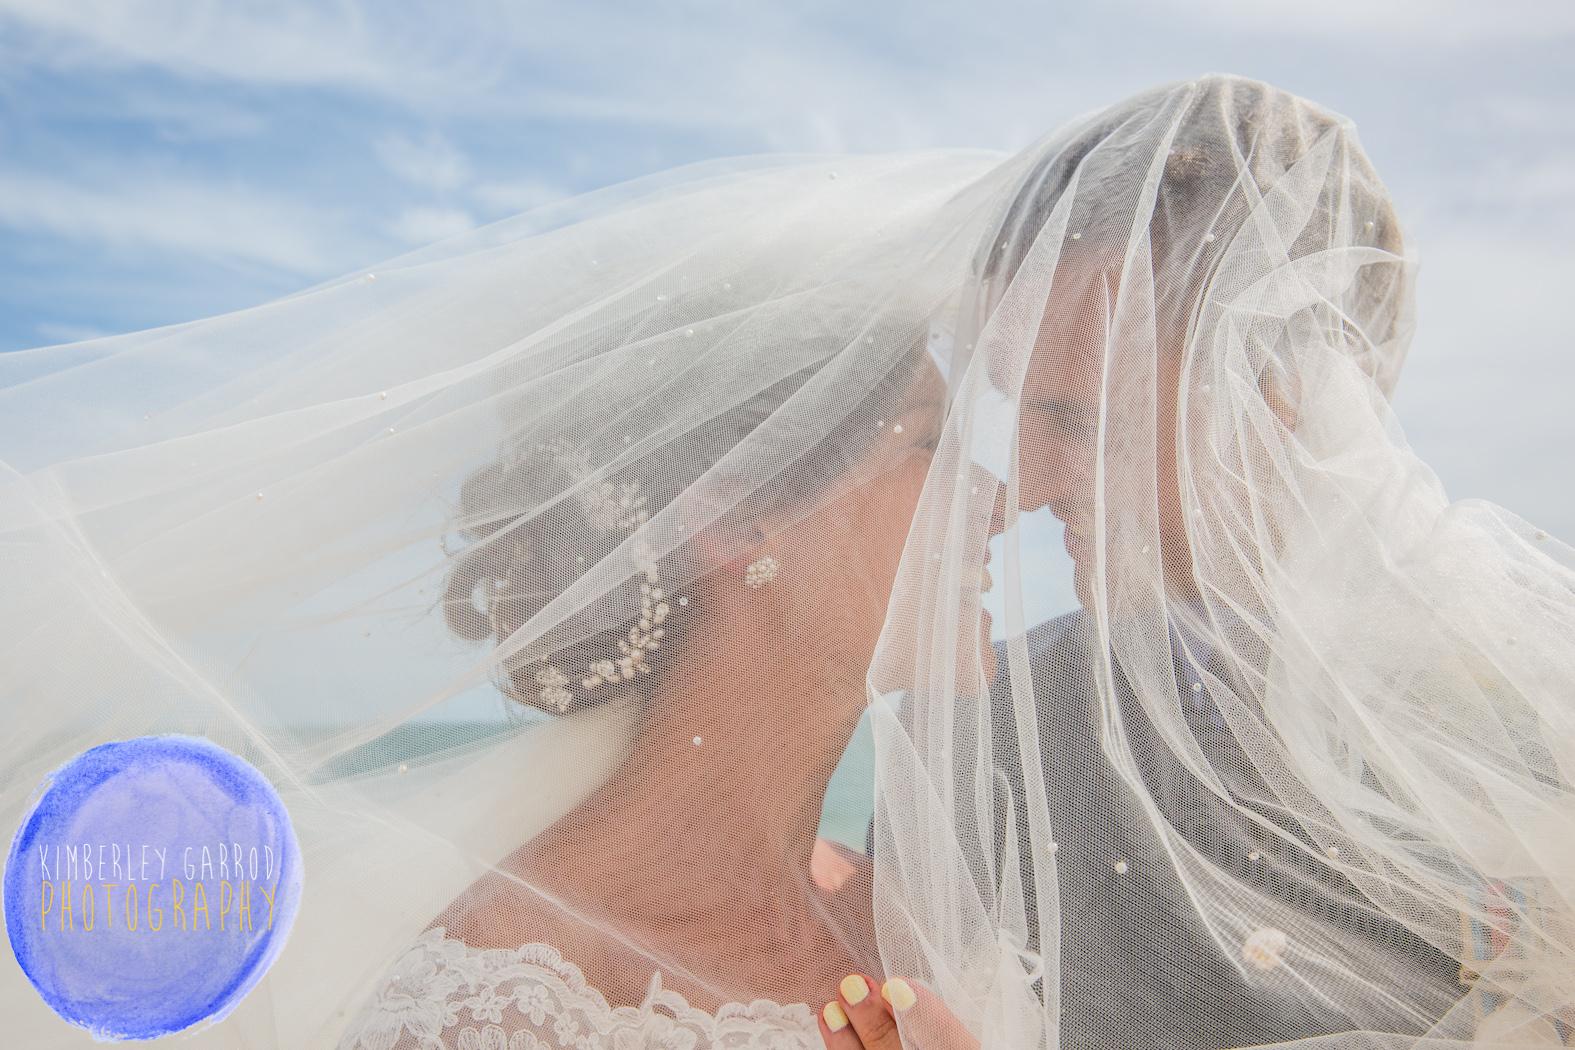 Royal Marines Museum Southsea Wedding Photographer Kimberley Garrod-13